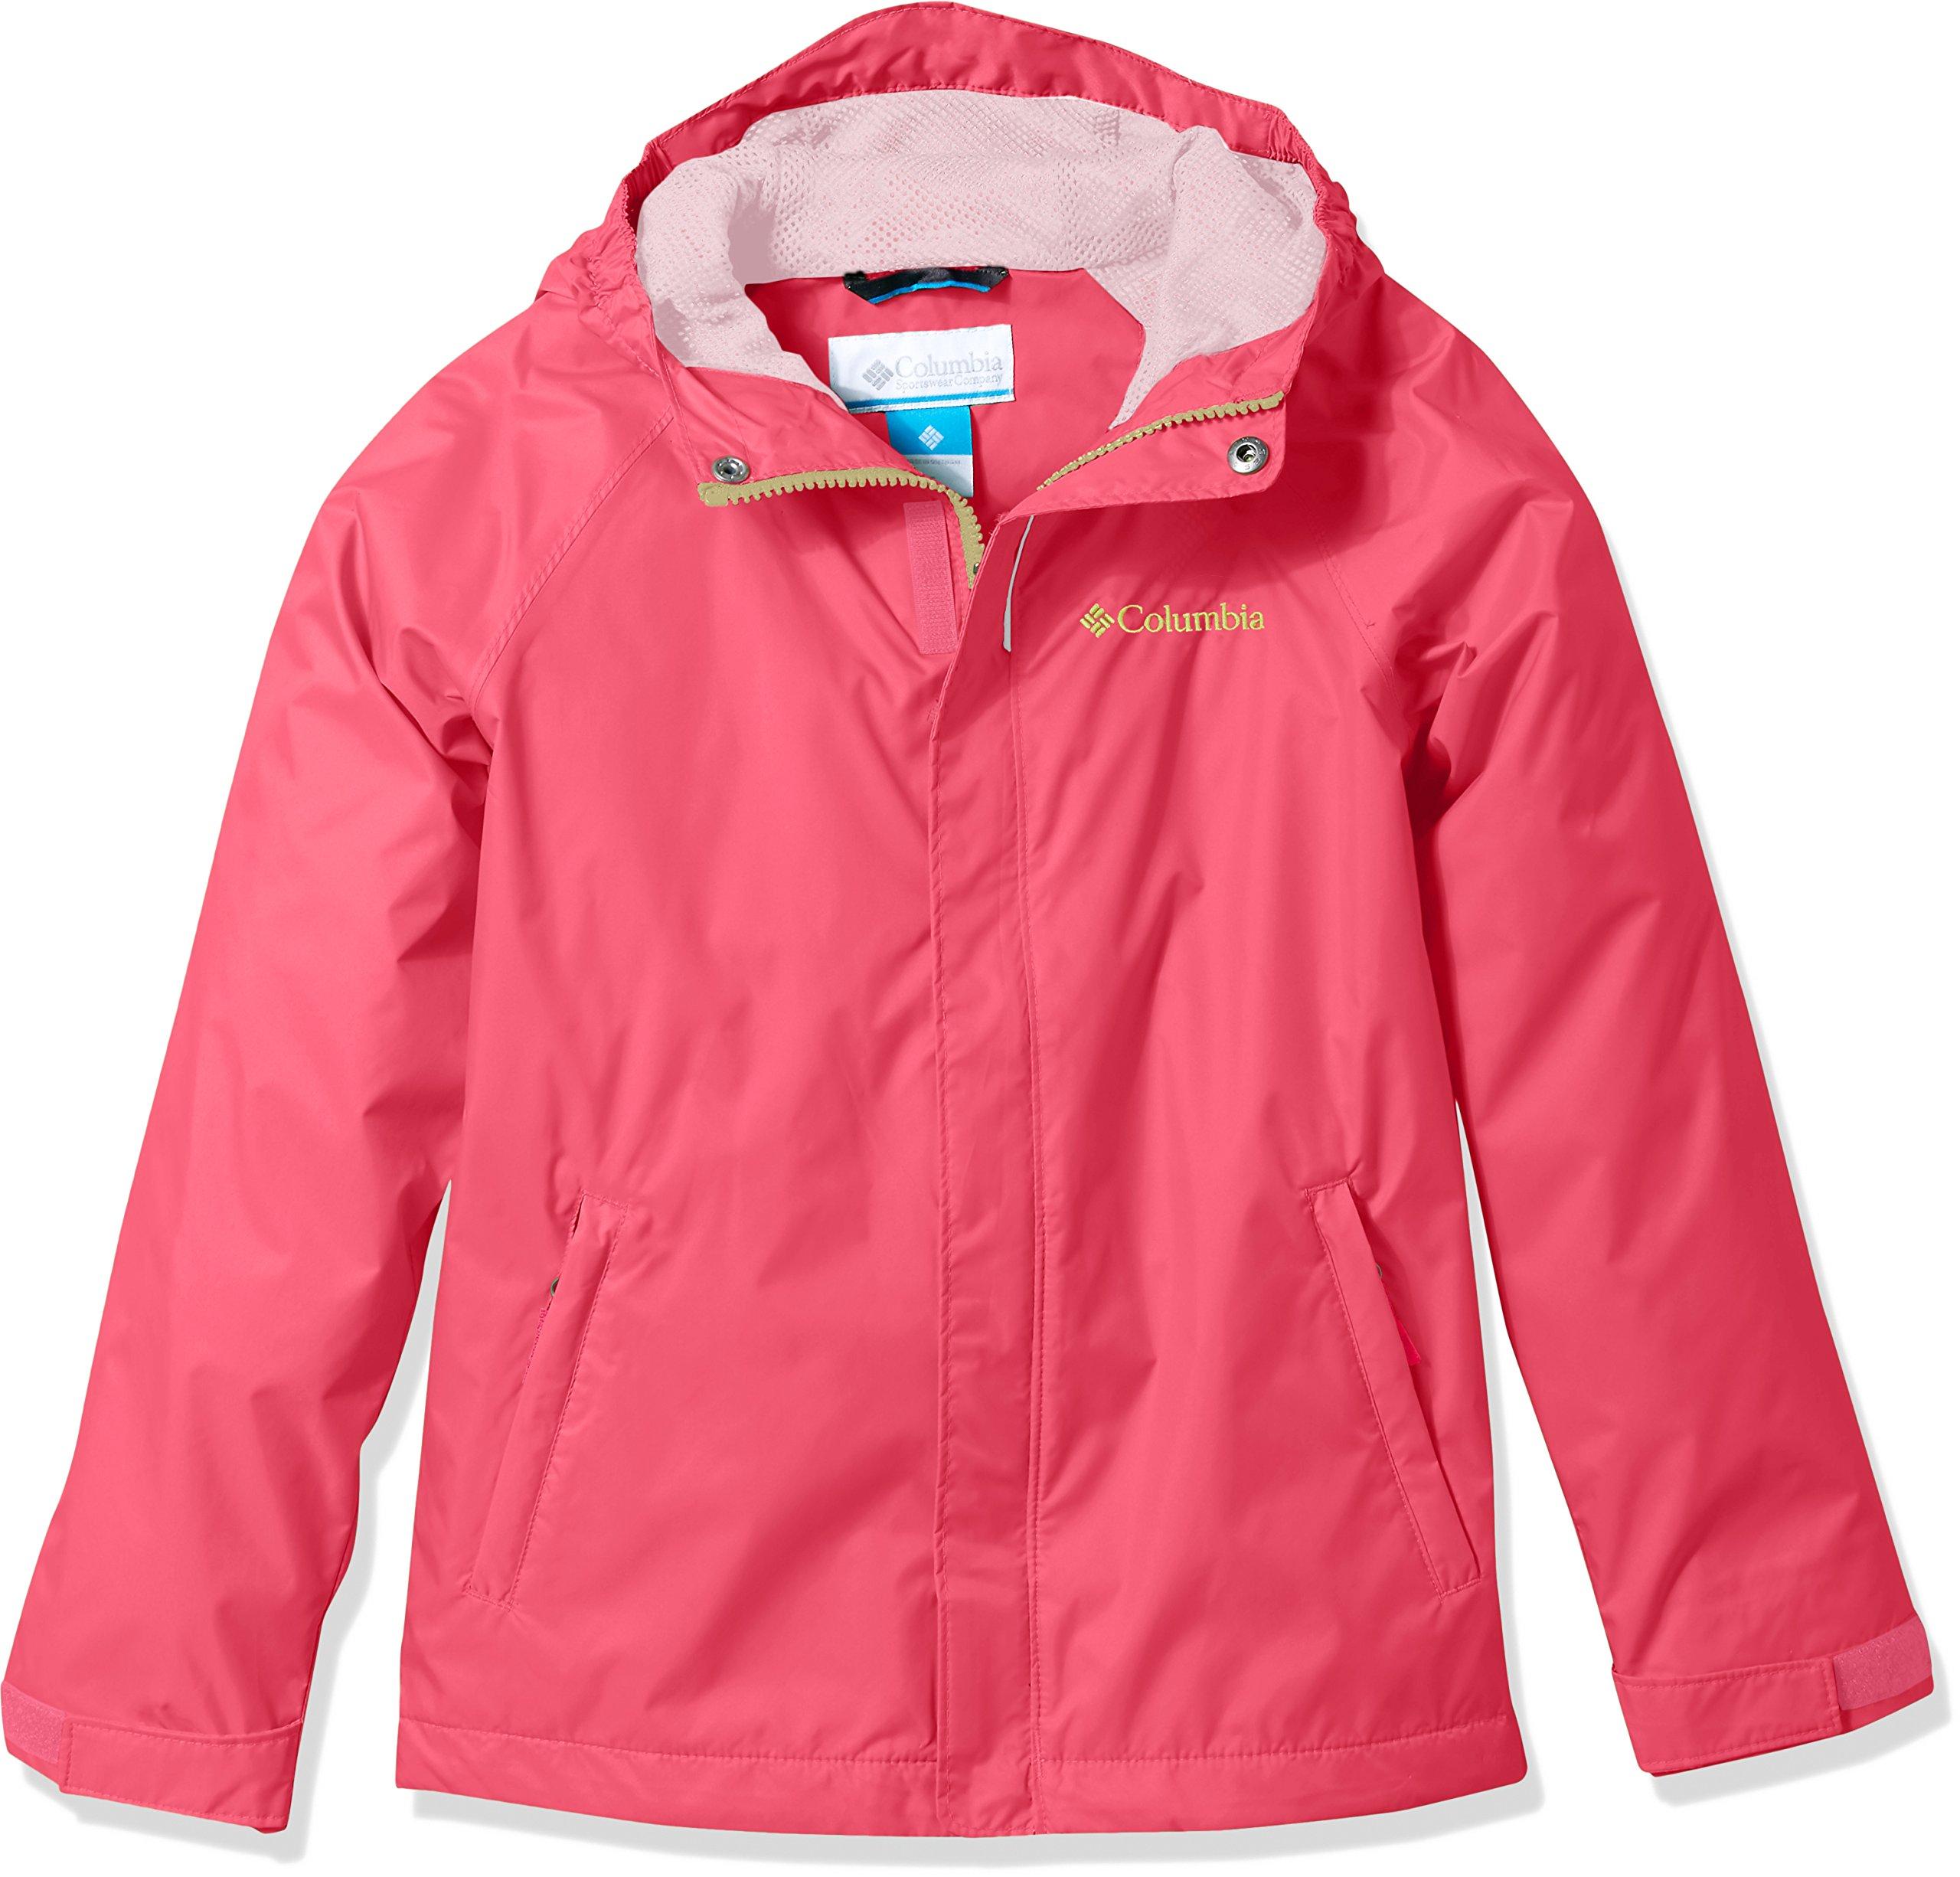 Columbia Kids' Big Boy's Fast and Curious Rain Jacket, Punch Pink Campin, XL